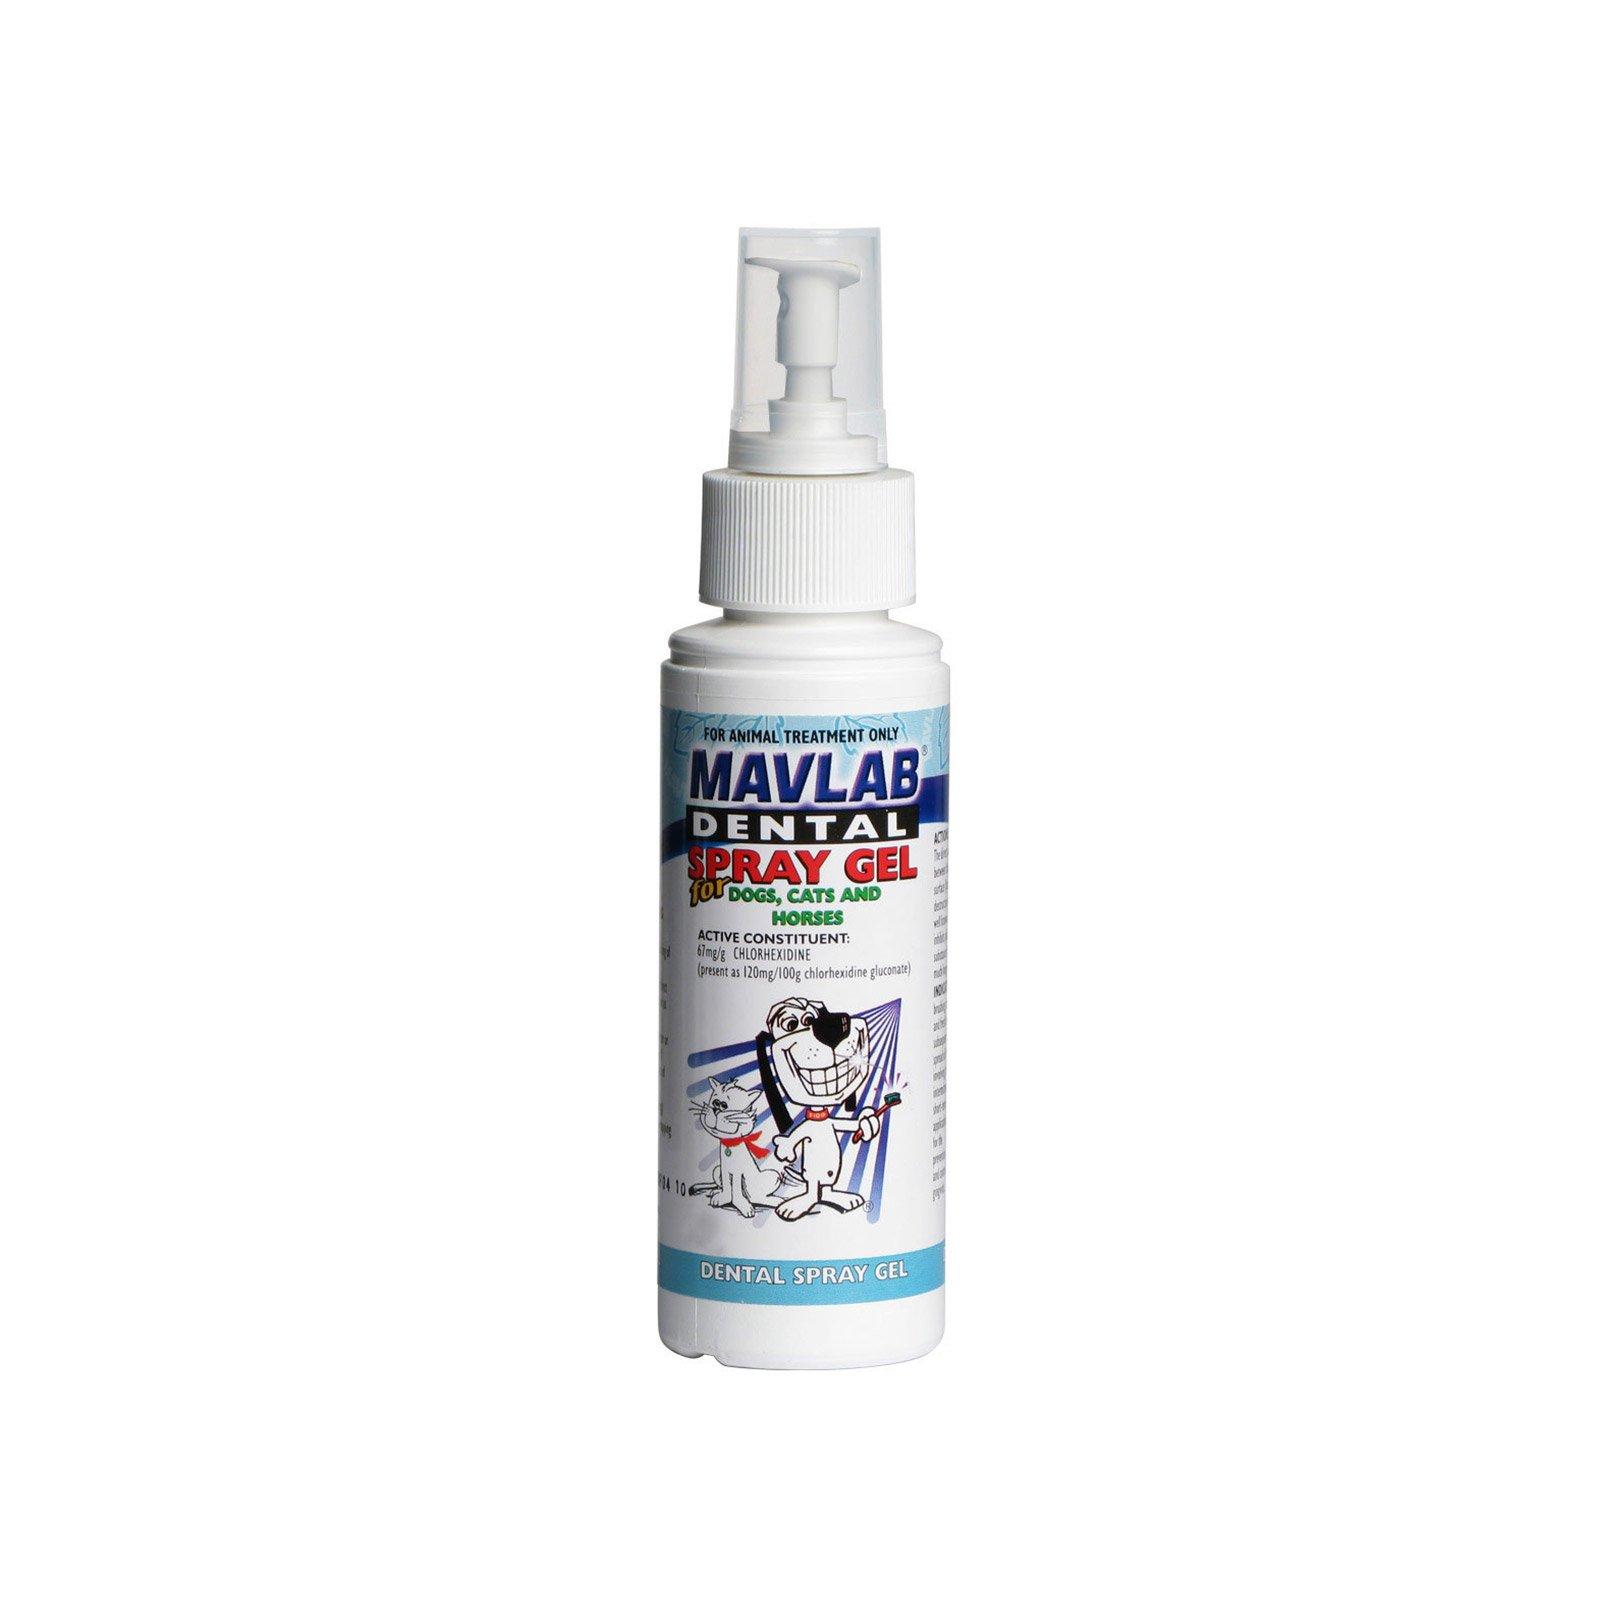 Mavlab Dental Spray Gel